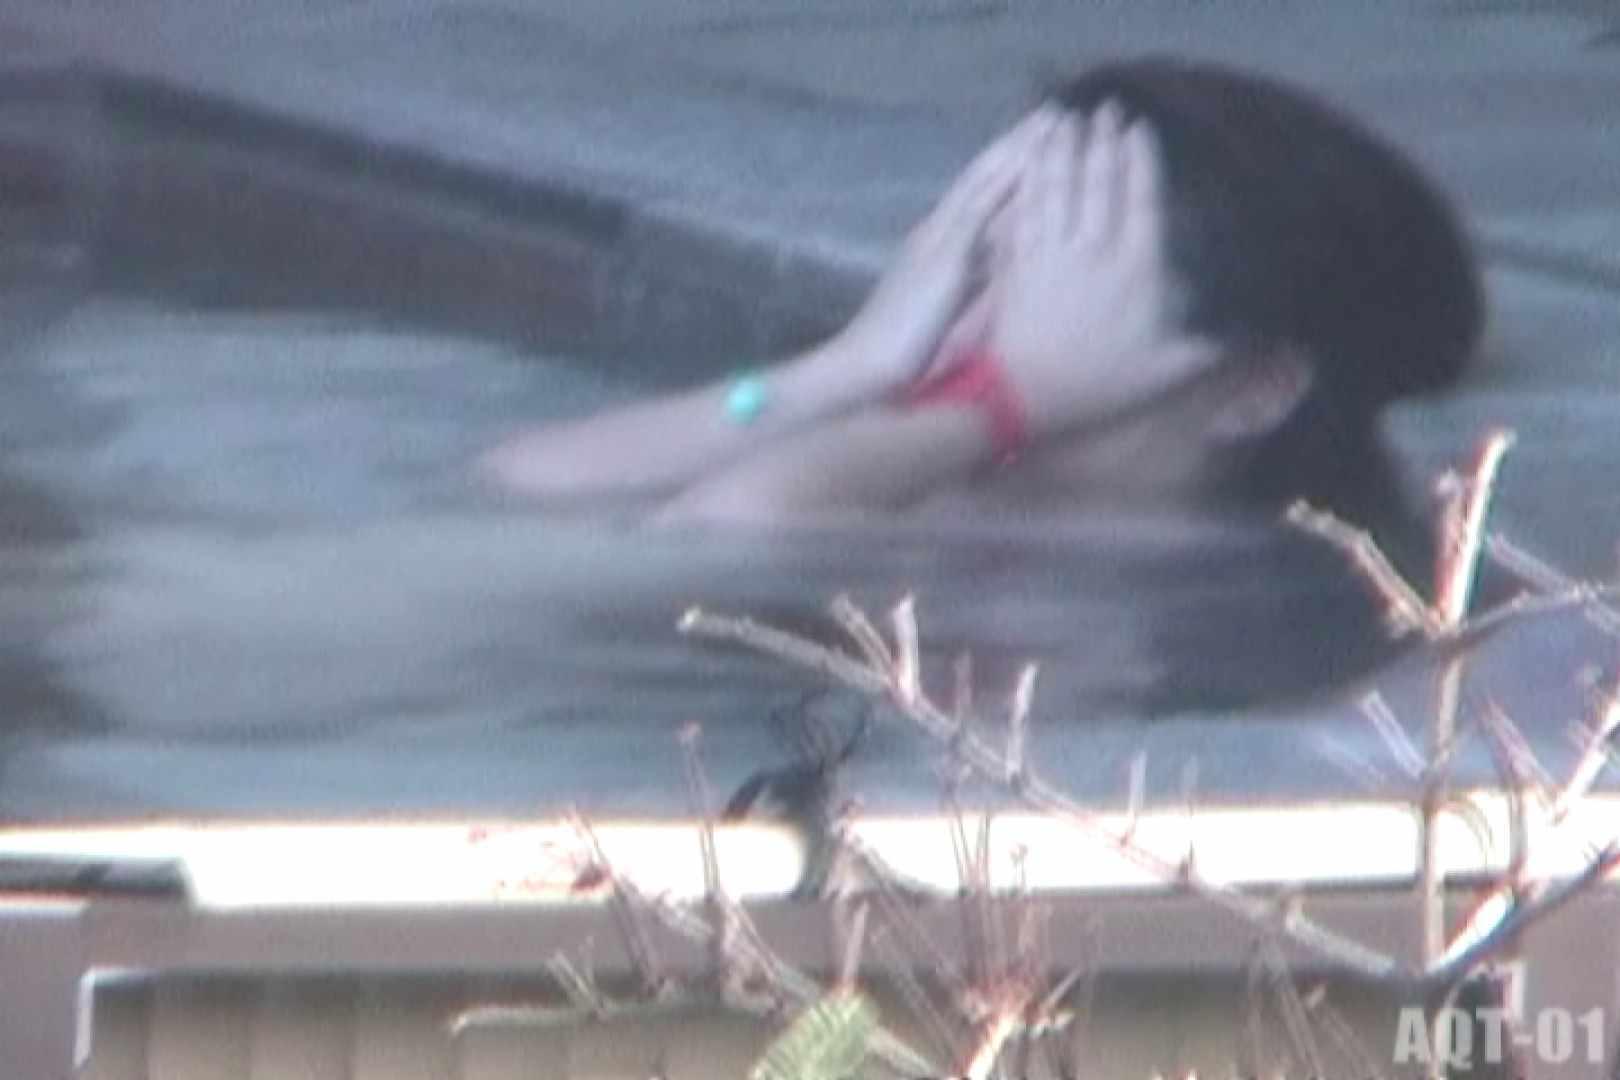 Aquaな露天風呂Vol.720 綺麗なOLたち AV無料動画キャプチャ 98枚 23